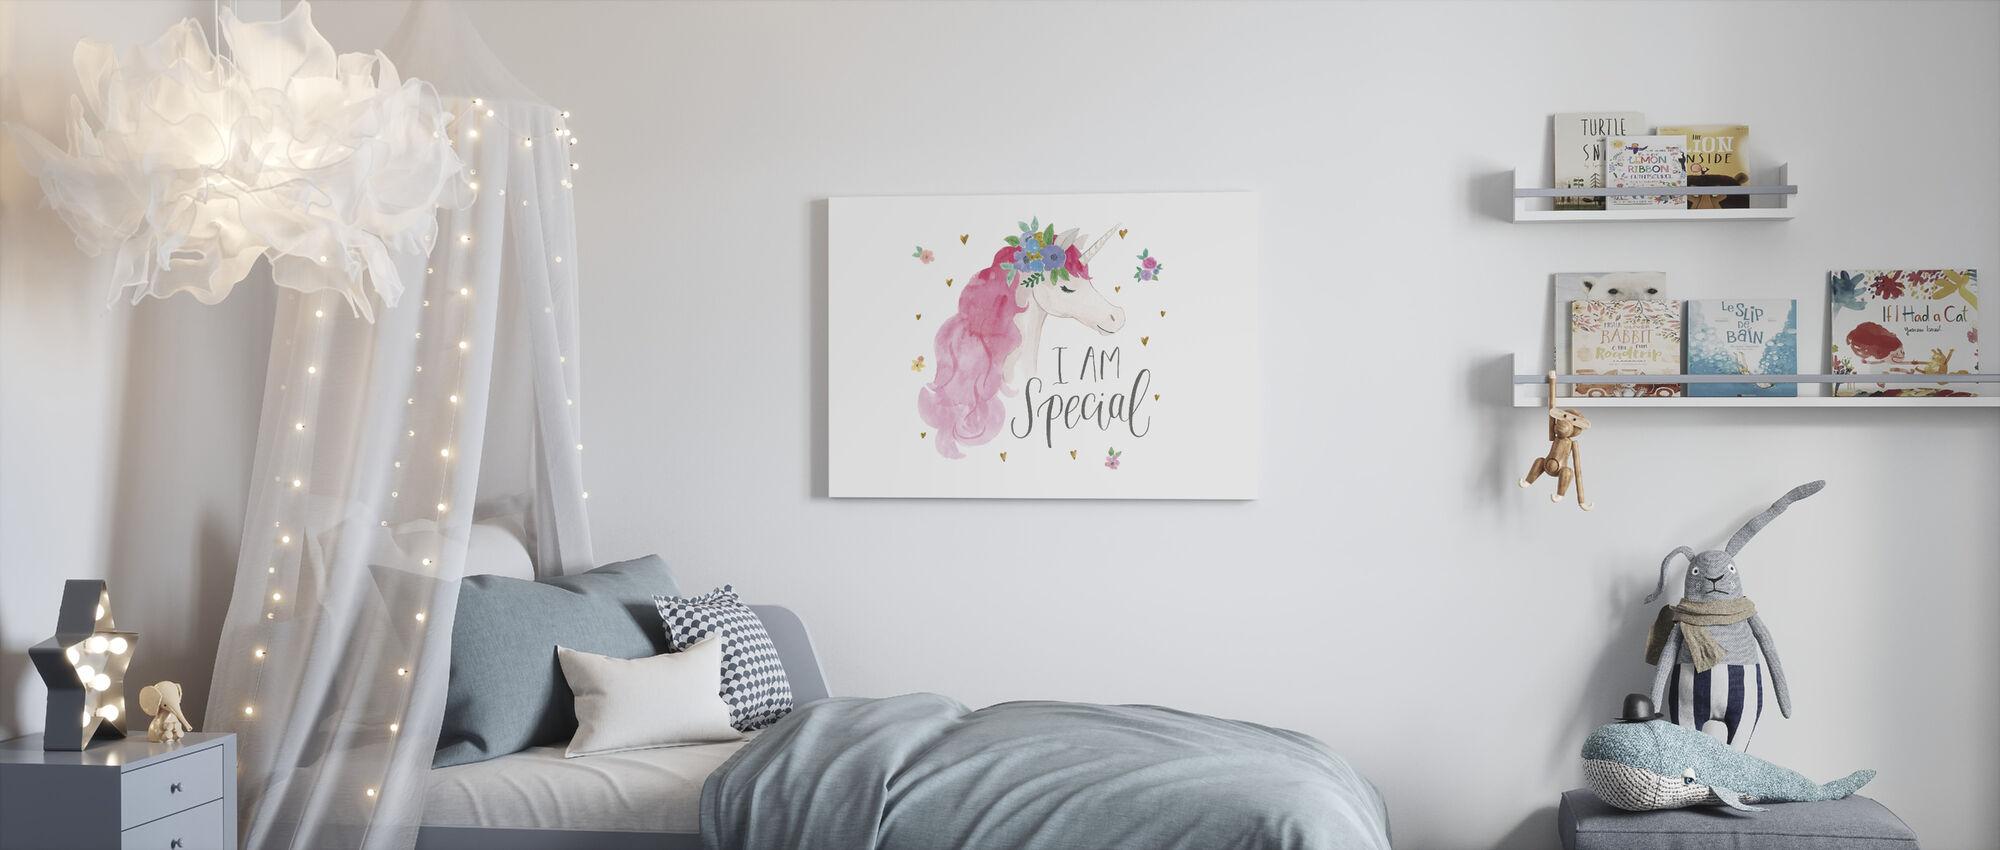 Magical Friends III - Canvas print - Kids Room